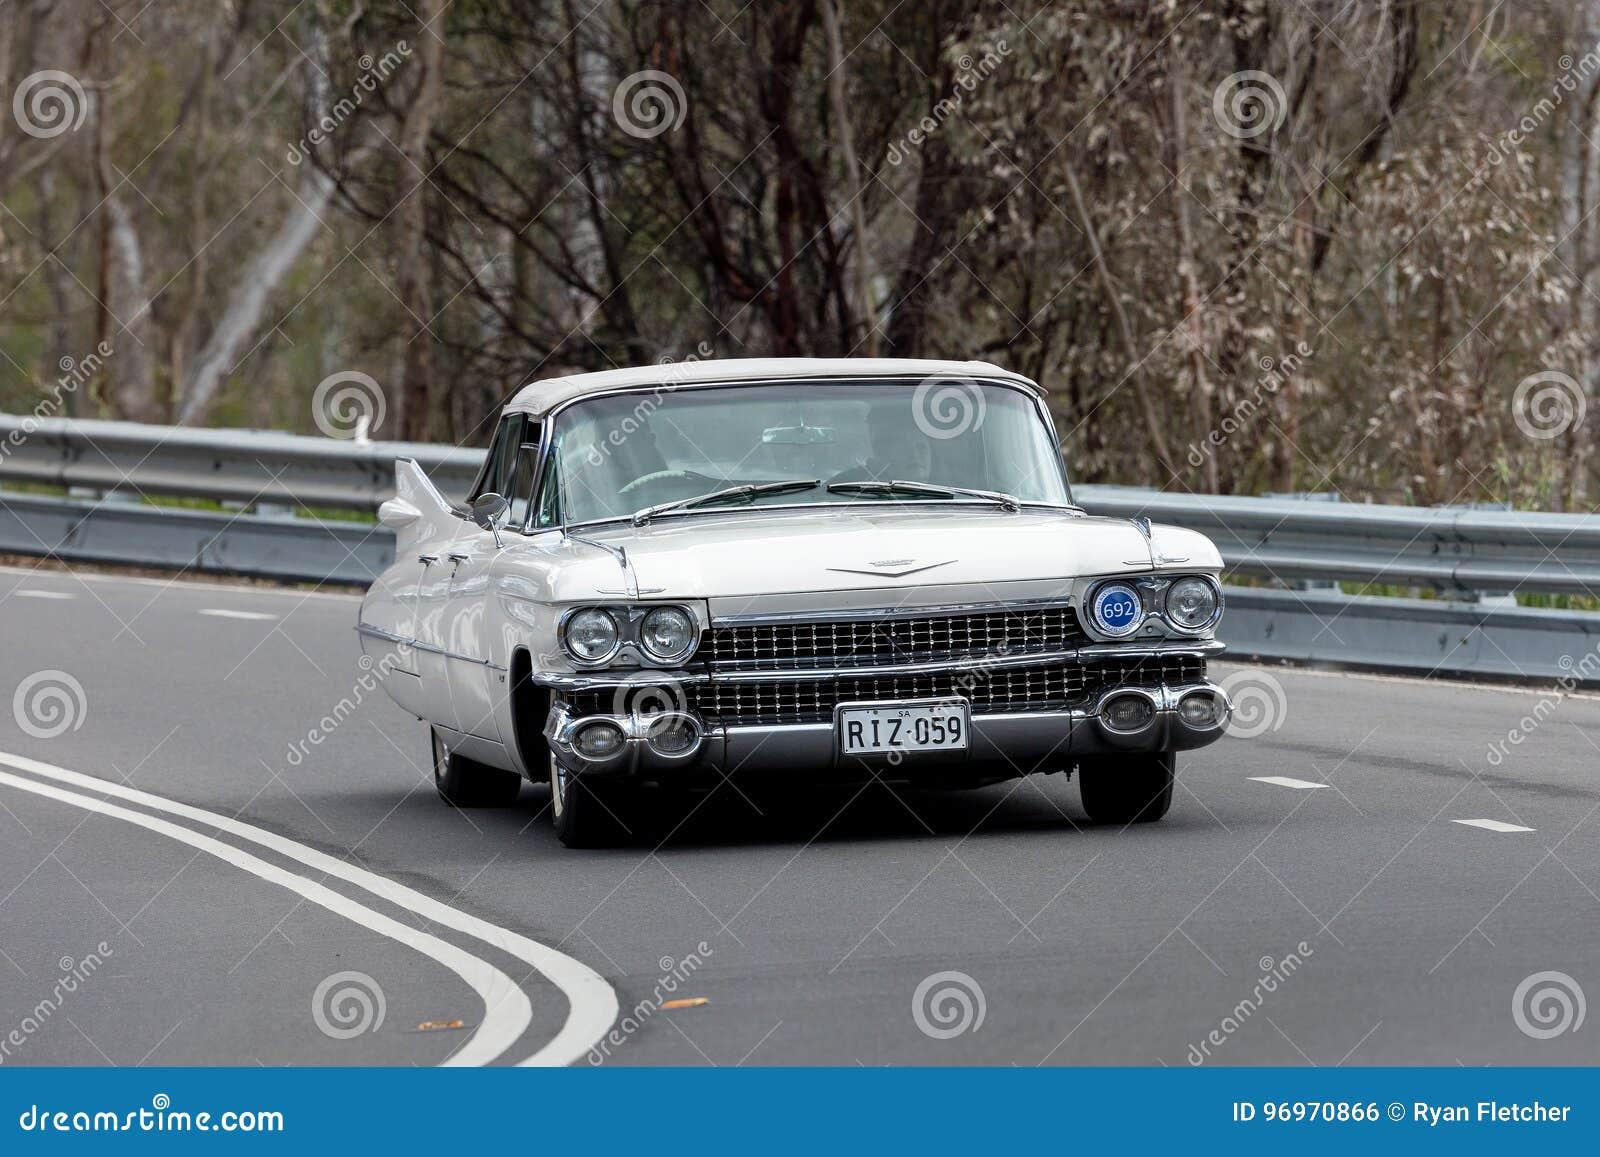 2016 Cadillac Convertible >> 1959 Cadillac Deville Convertible Editorial Photo Image Of